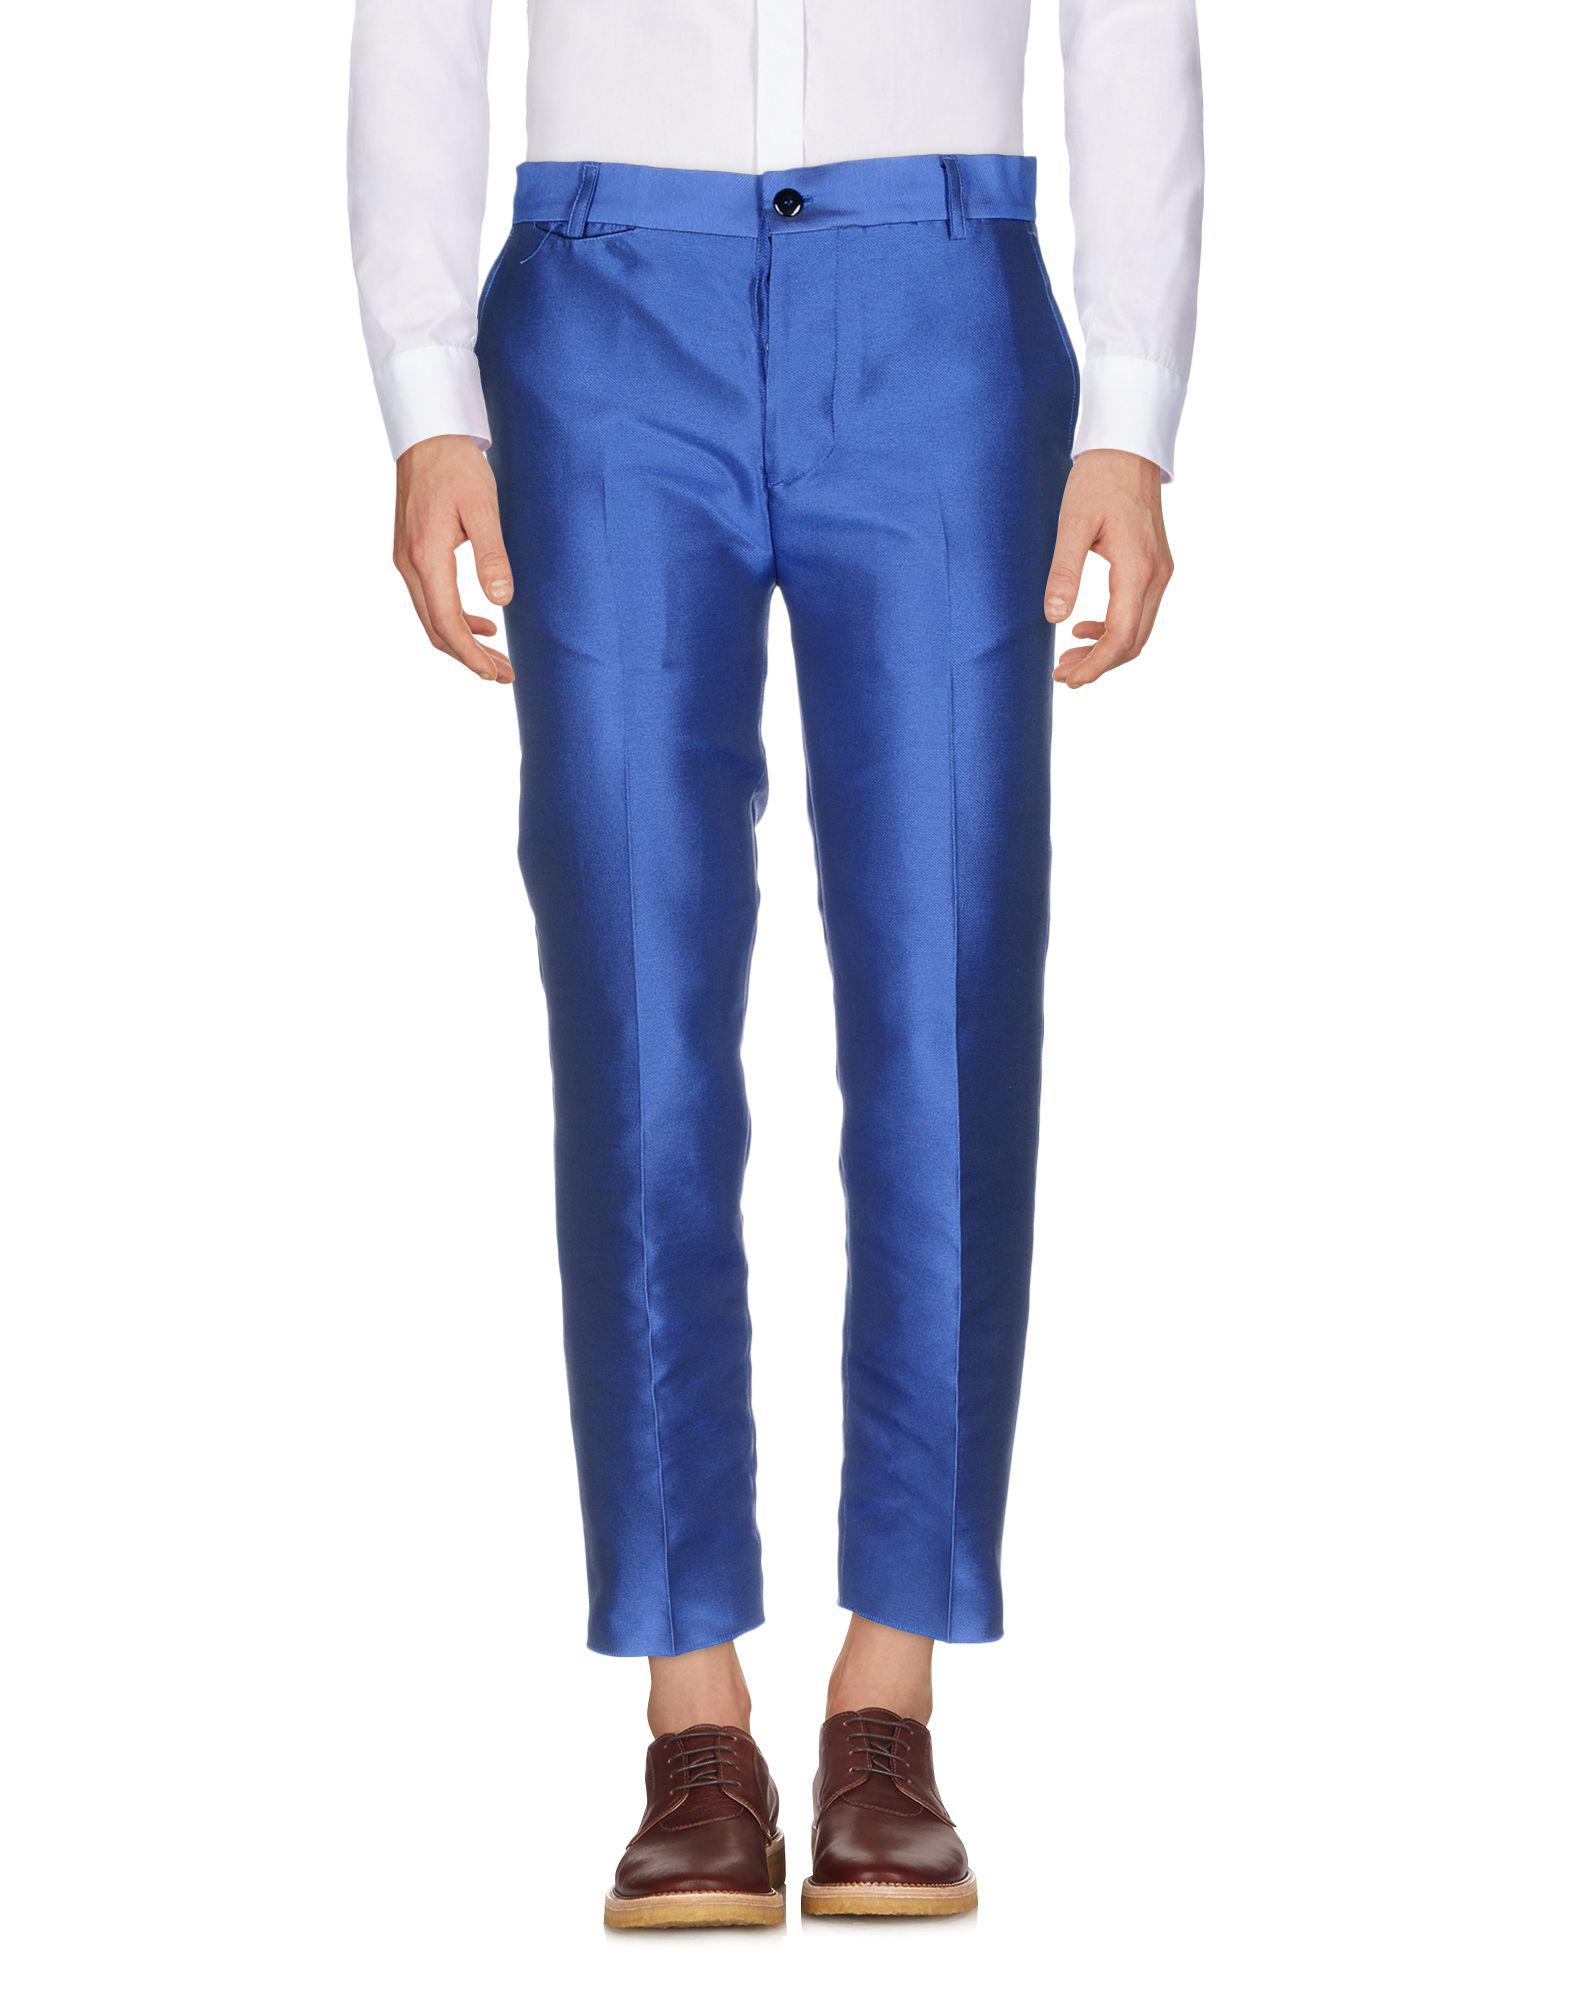 Pantalon - Pantalon Casual Pellizzari Christian fqwOUF0